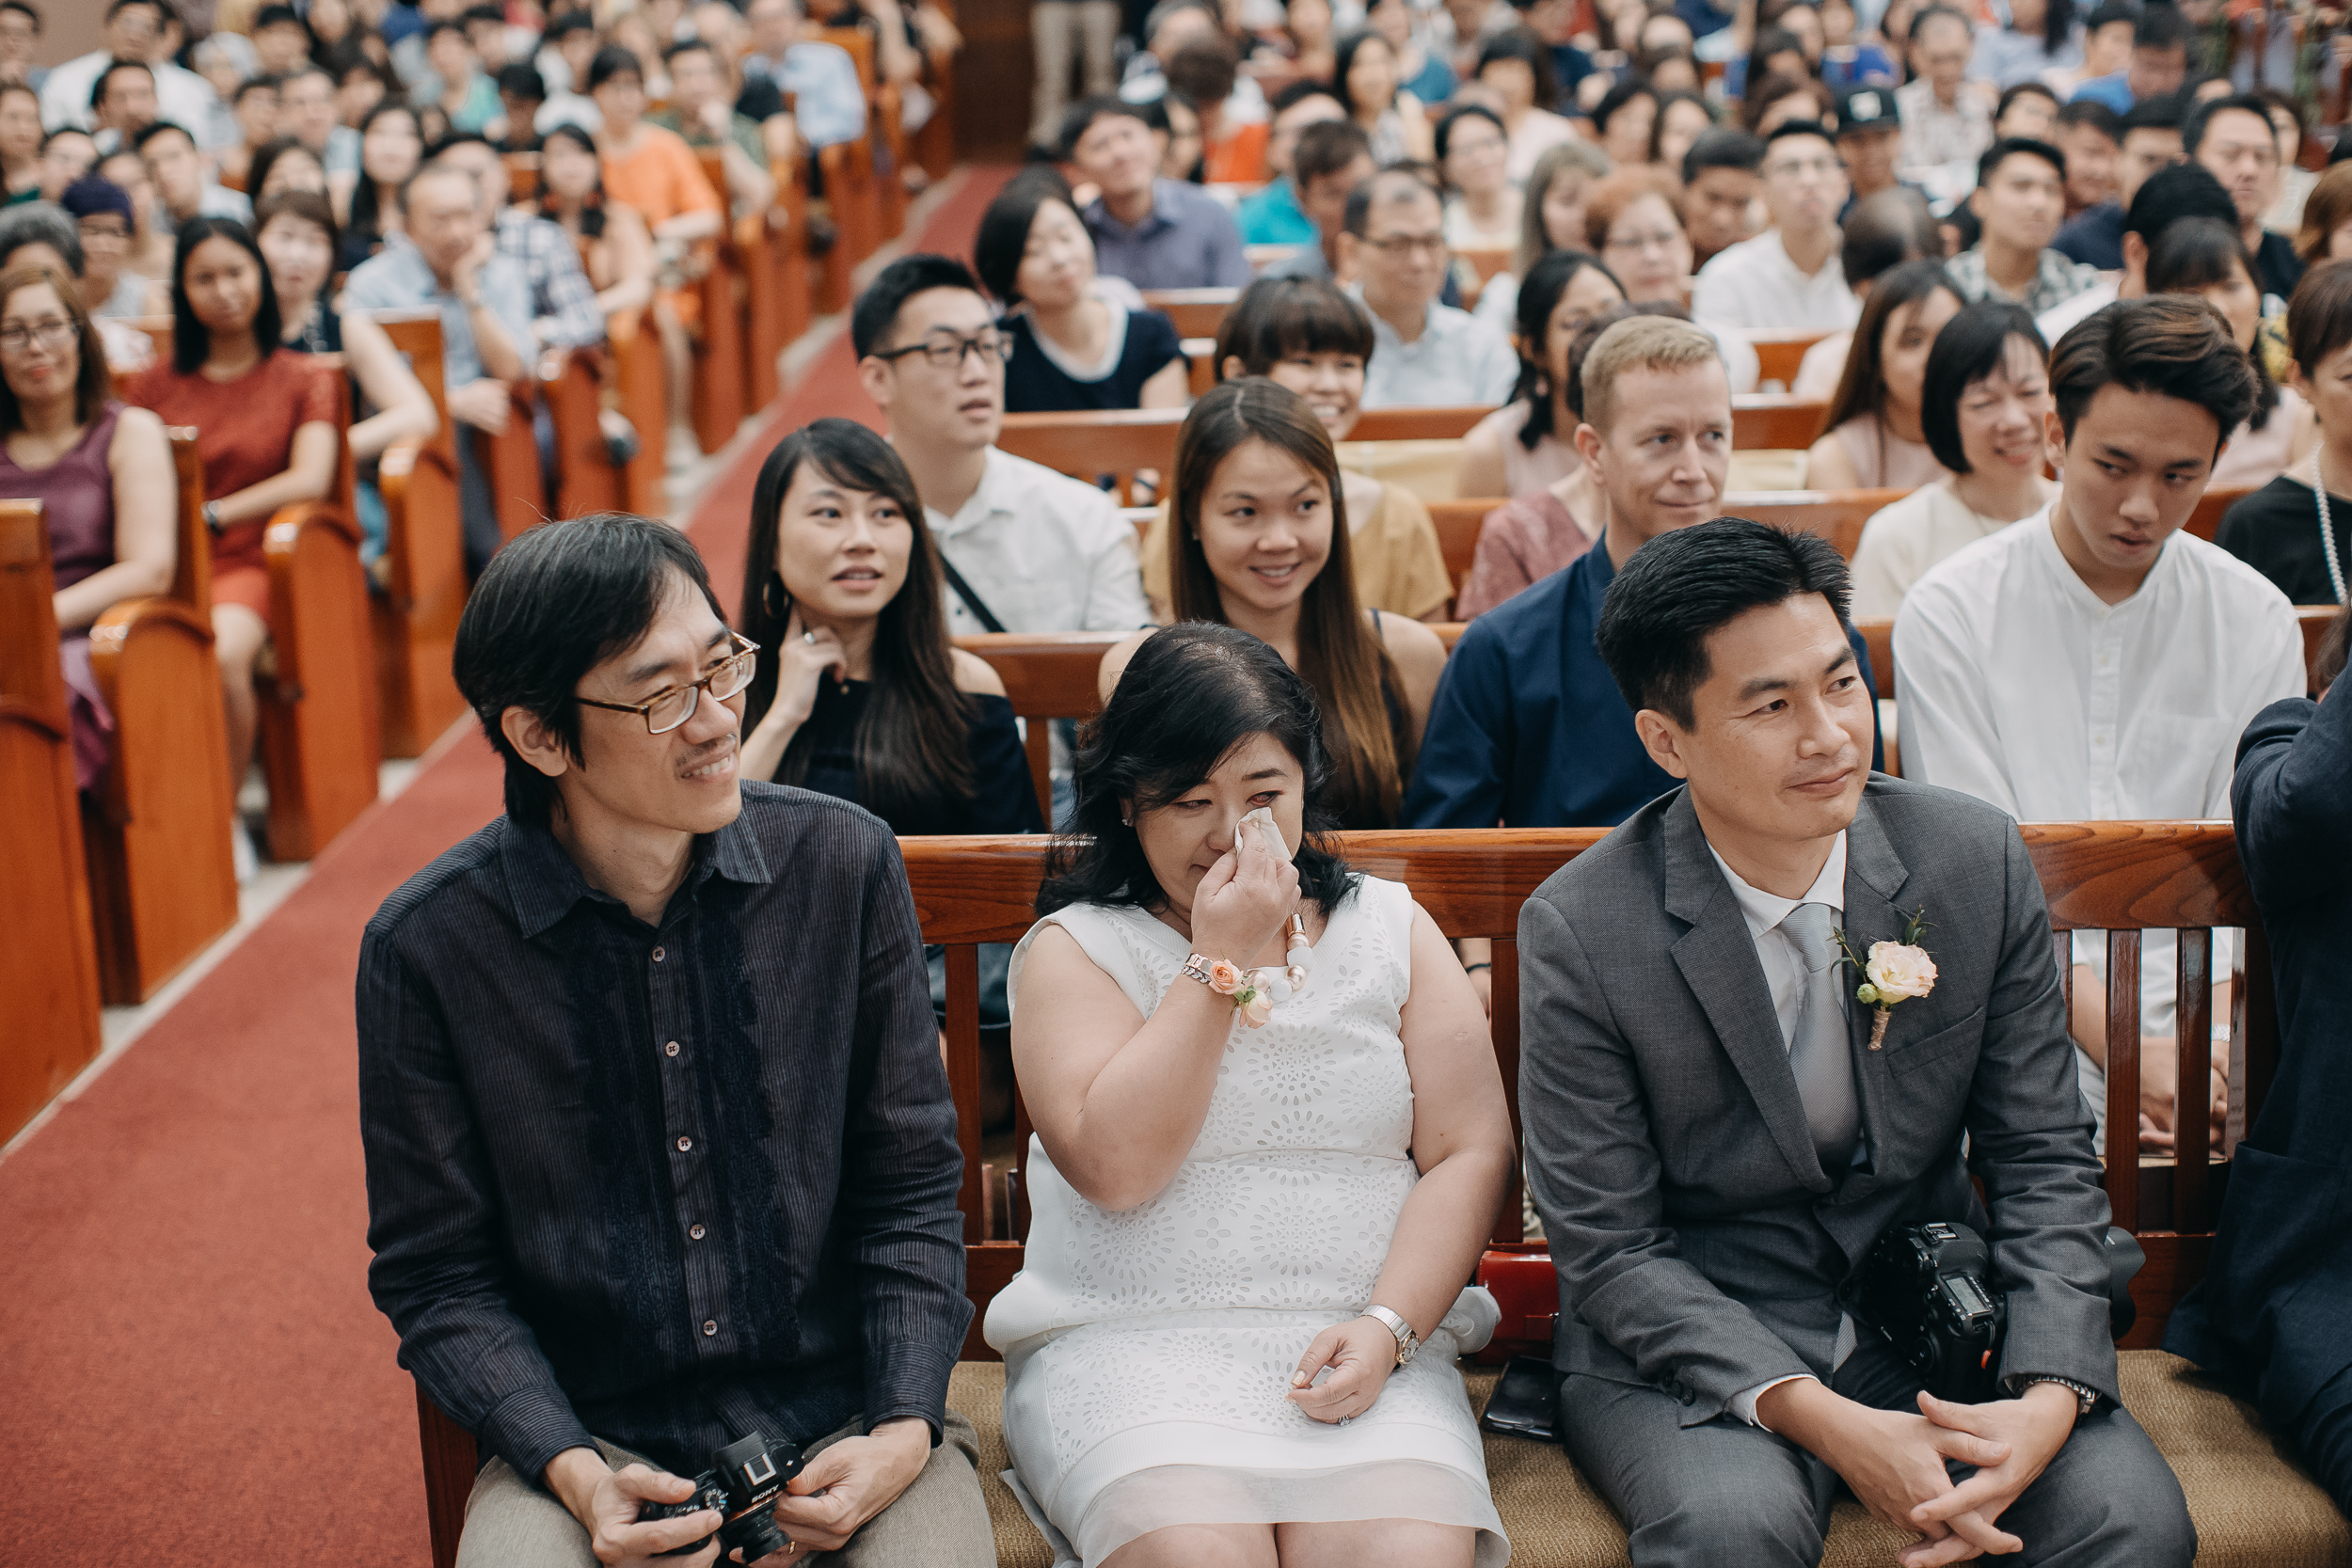 Singapore+Actual+Day+Wedding+Photographer+Min+Jiang+Rochester+Gareth+Faith--0051.jpg